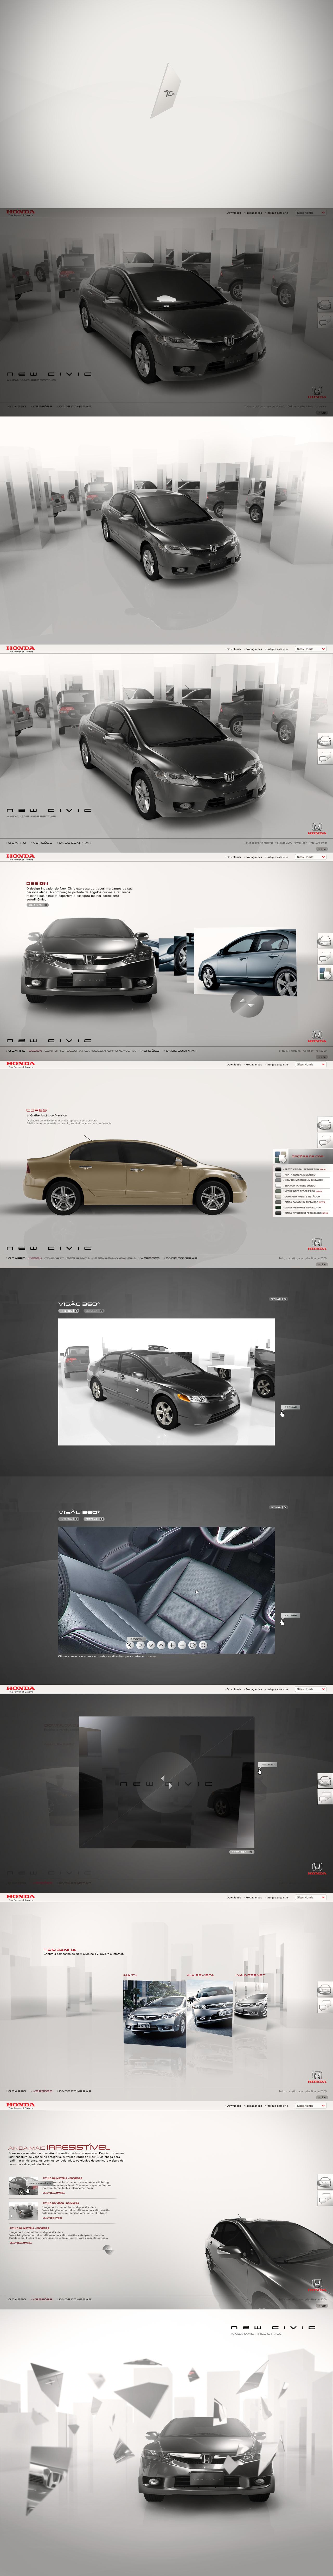 New Honda Civic 2009